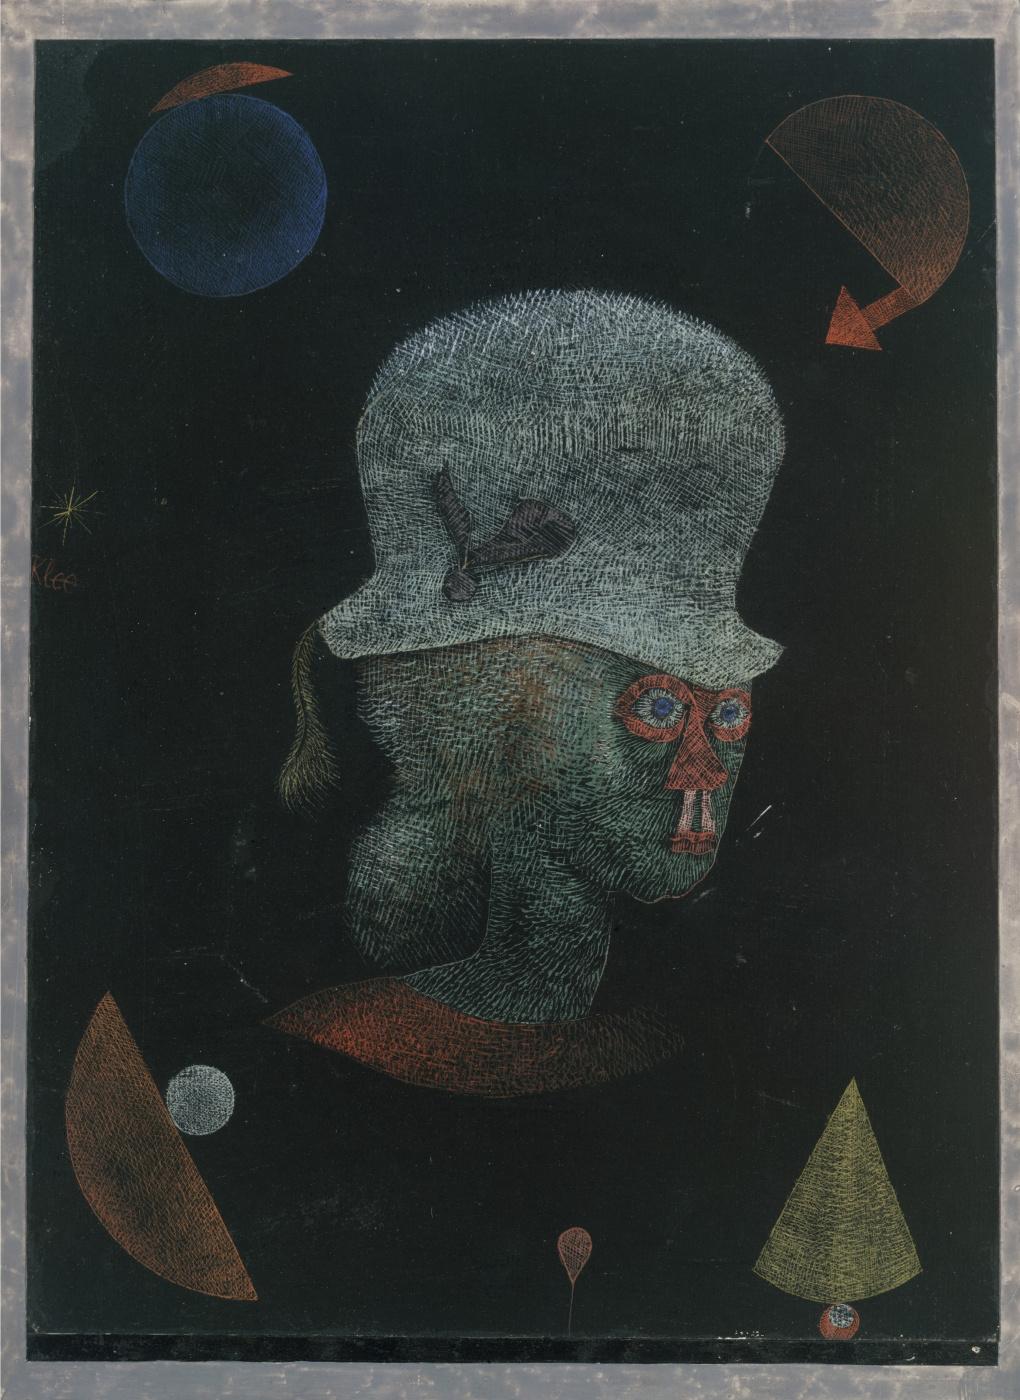 Paul Klee. Astrological fantasy portrait